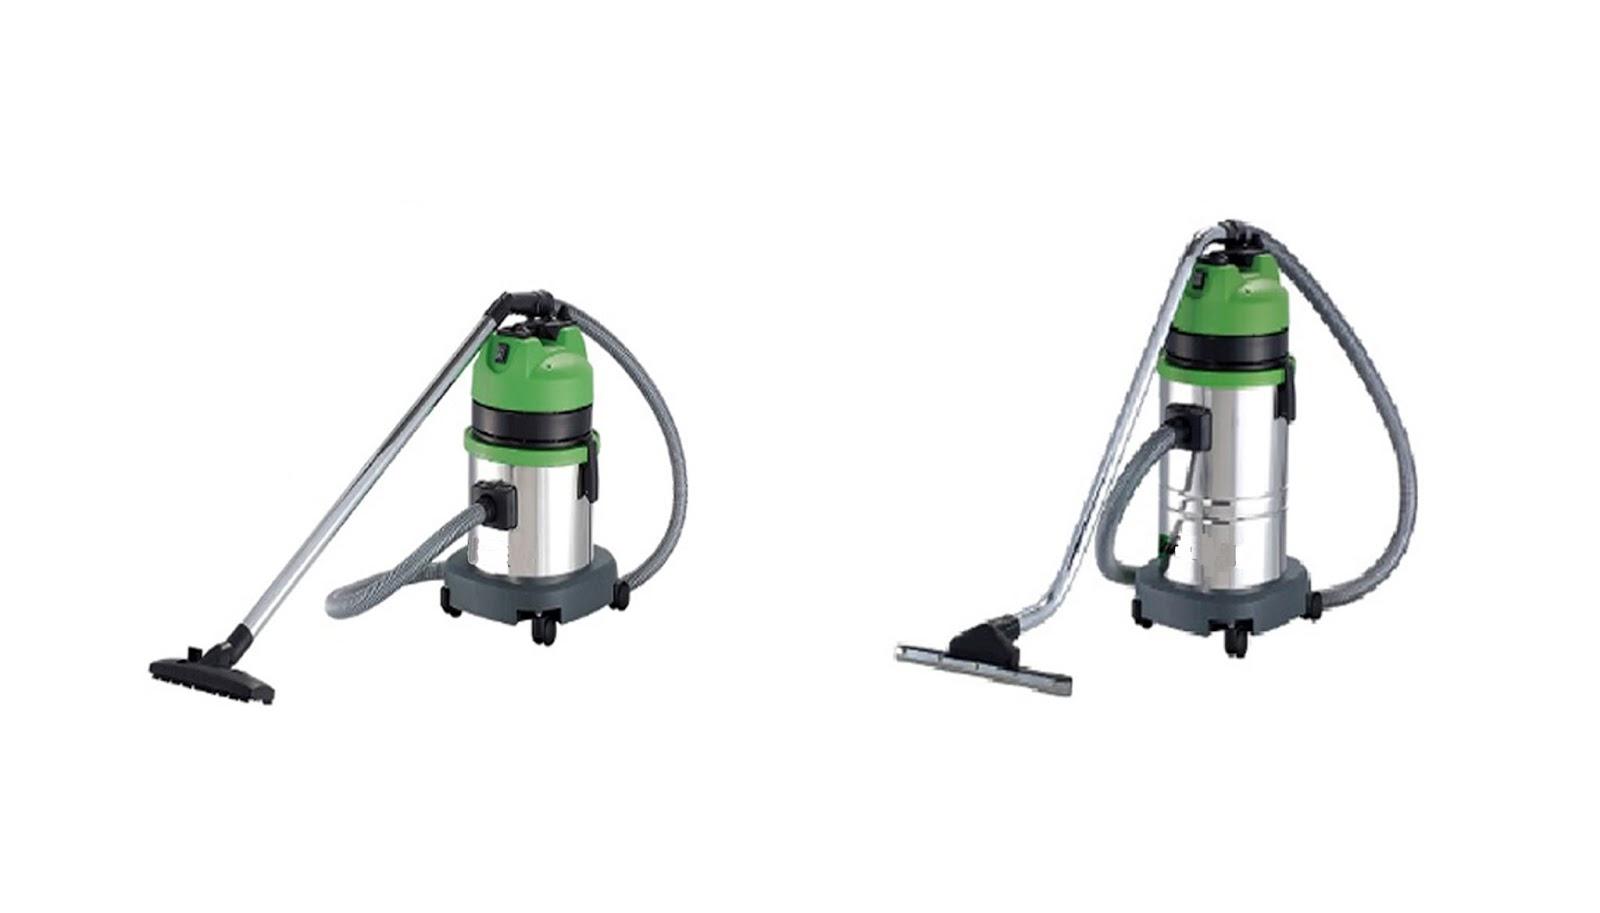 Menyewakan Mesin Kebersihan Sewa Mesin Polisher Wet Dry Vacuum